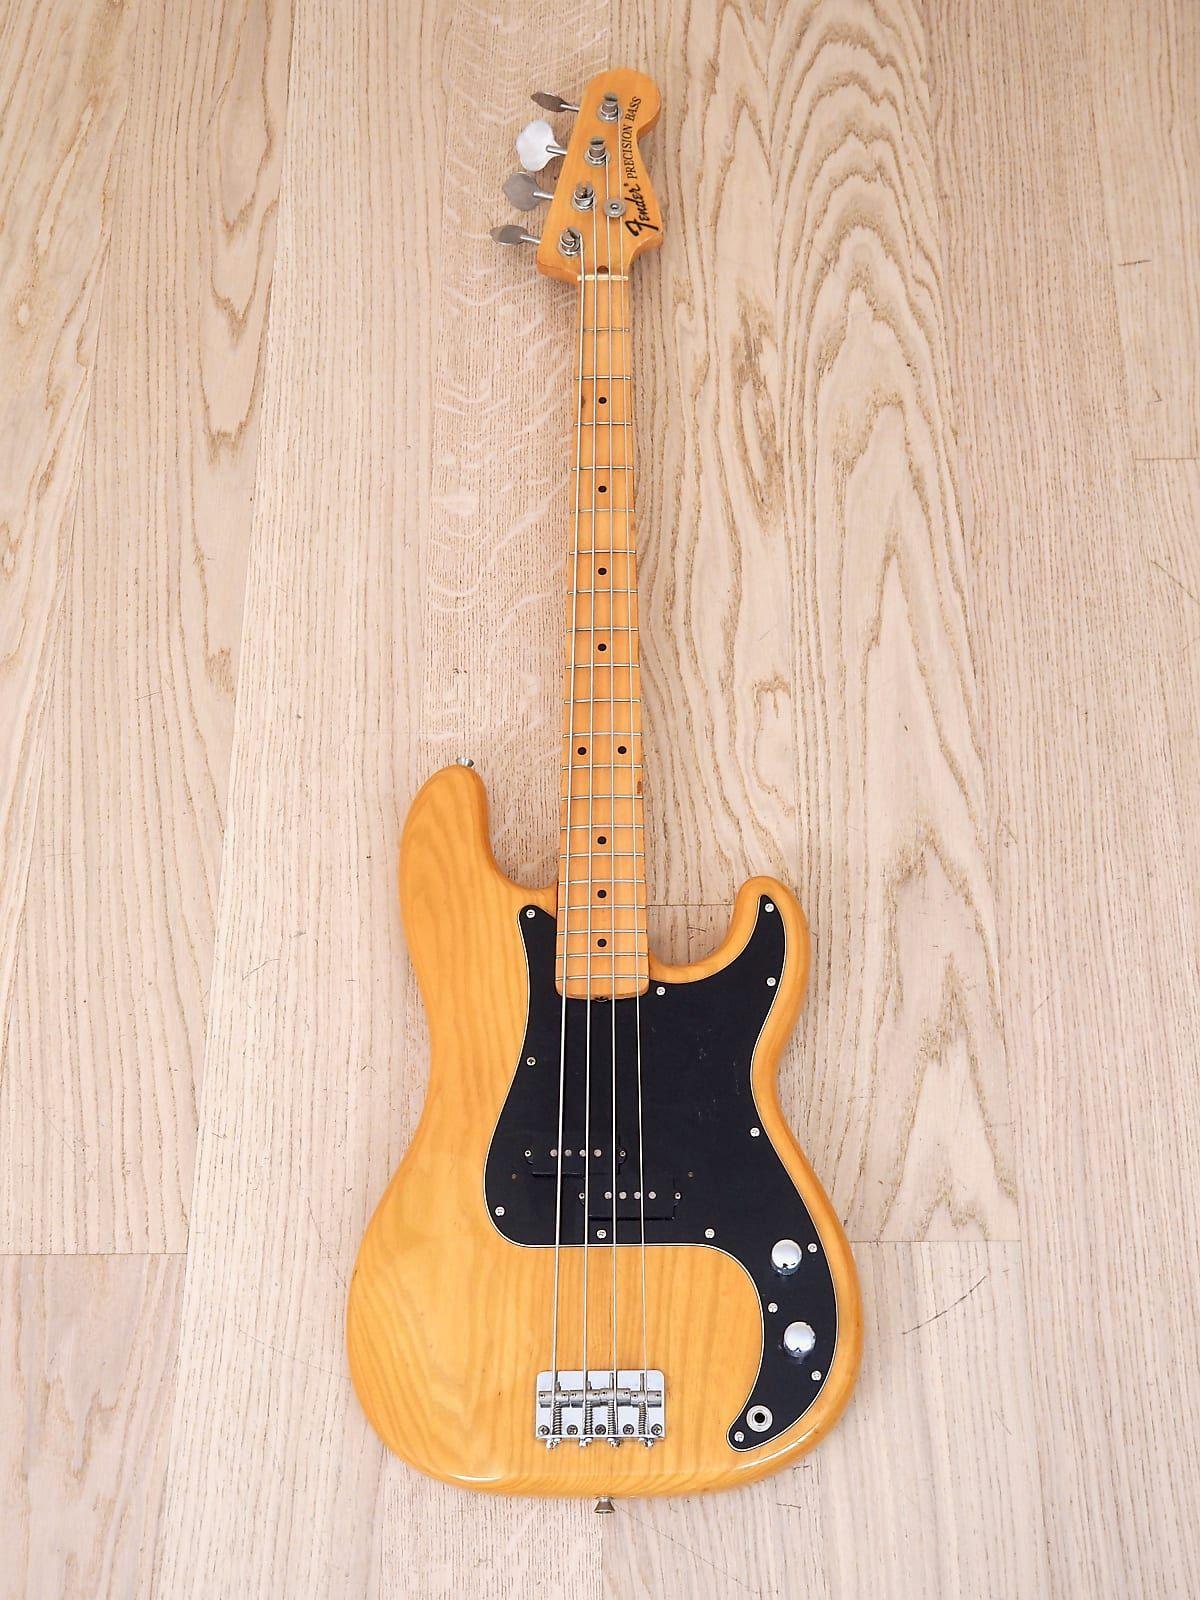 Fender Jb 75 Jazz Bass Reissue Mij Reverb Bass Fender Precision Bass Fender